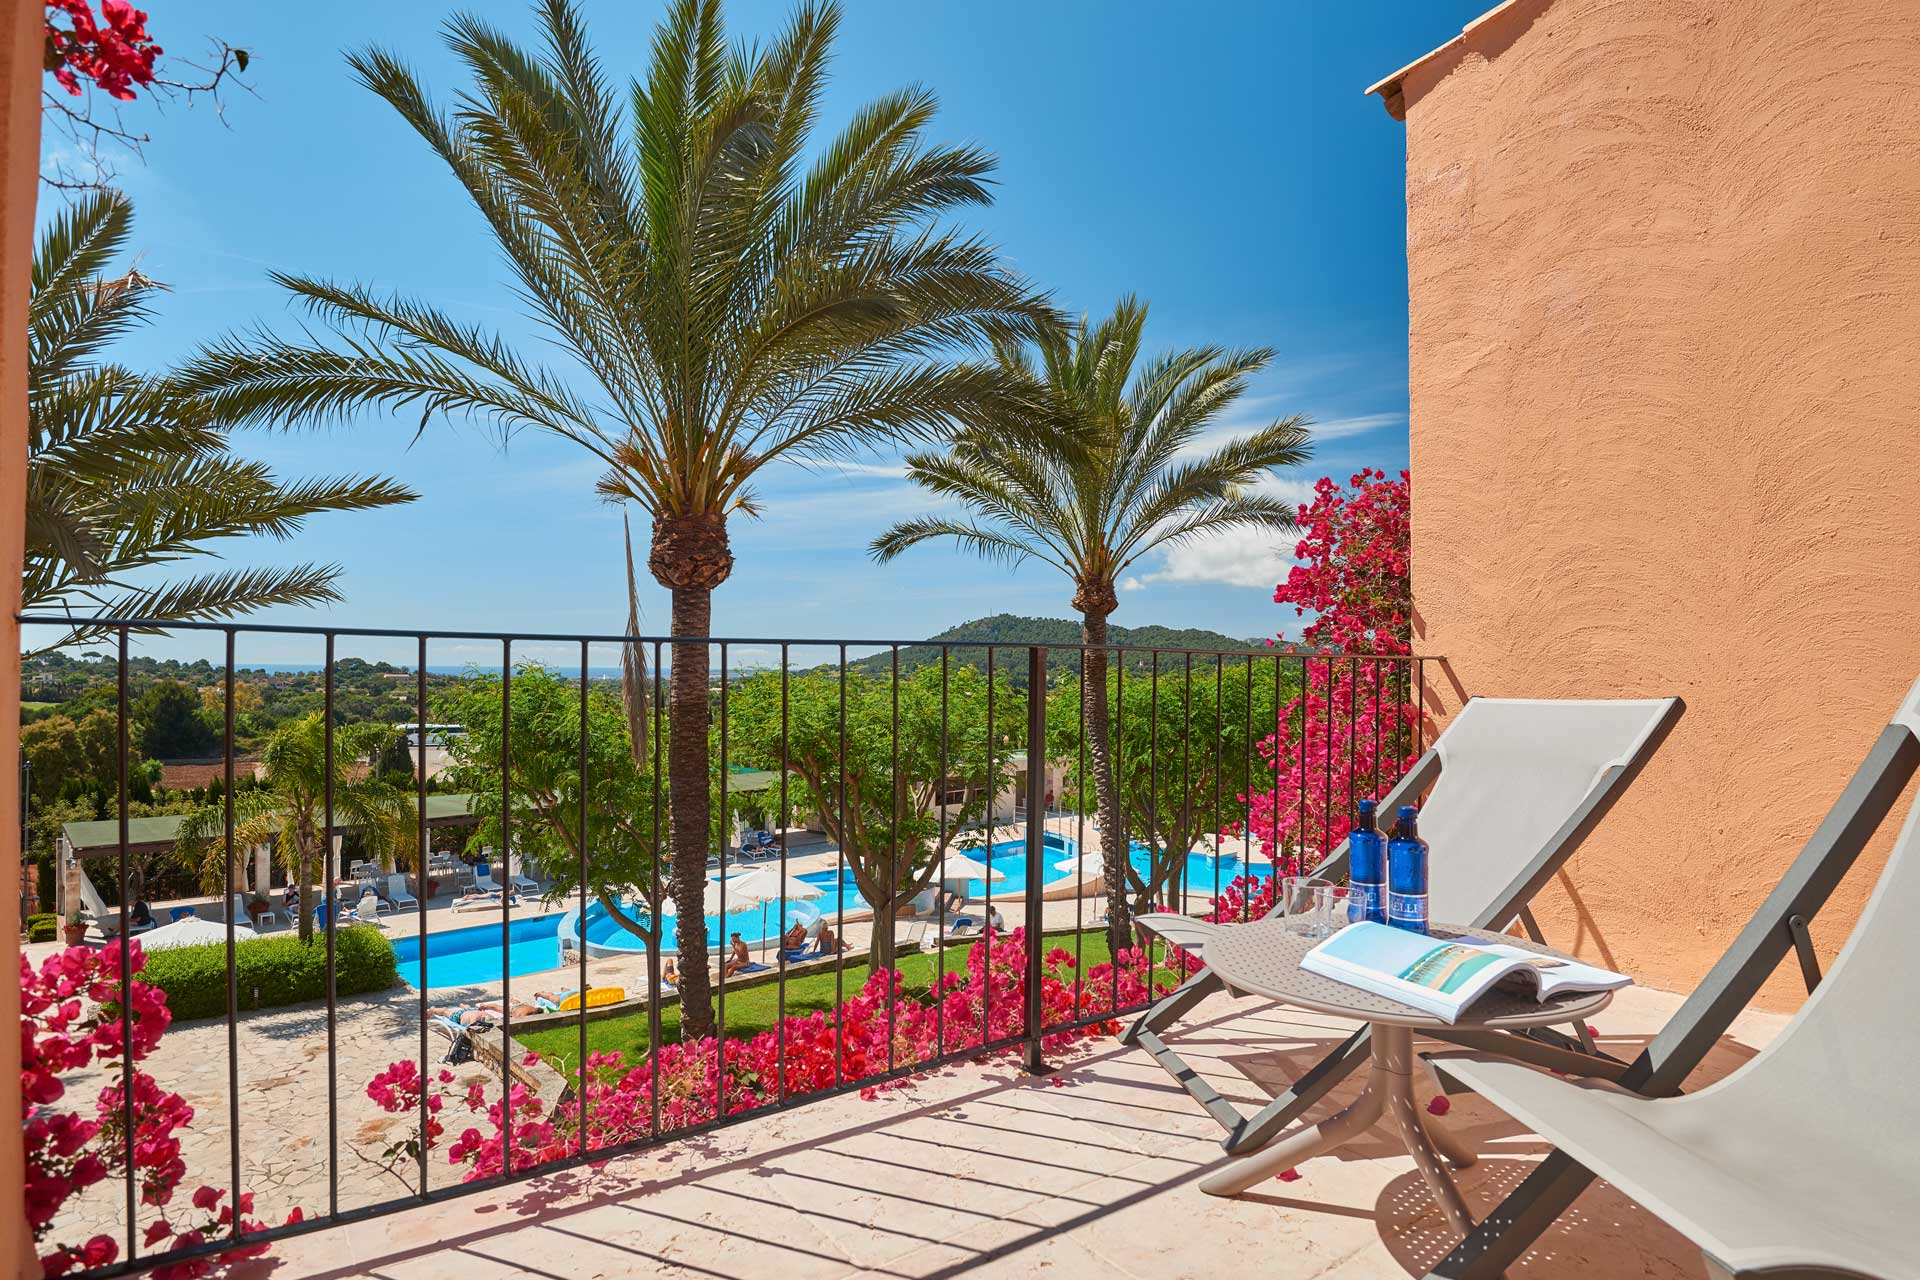 Finca-Hotel Sentido Pula Suites - Superior Suite balcony or terrace